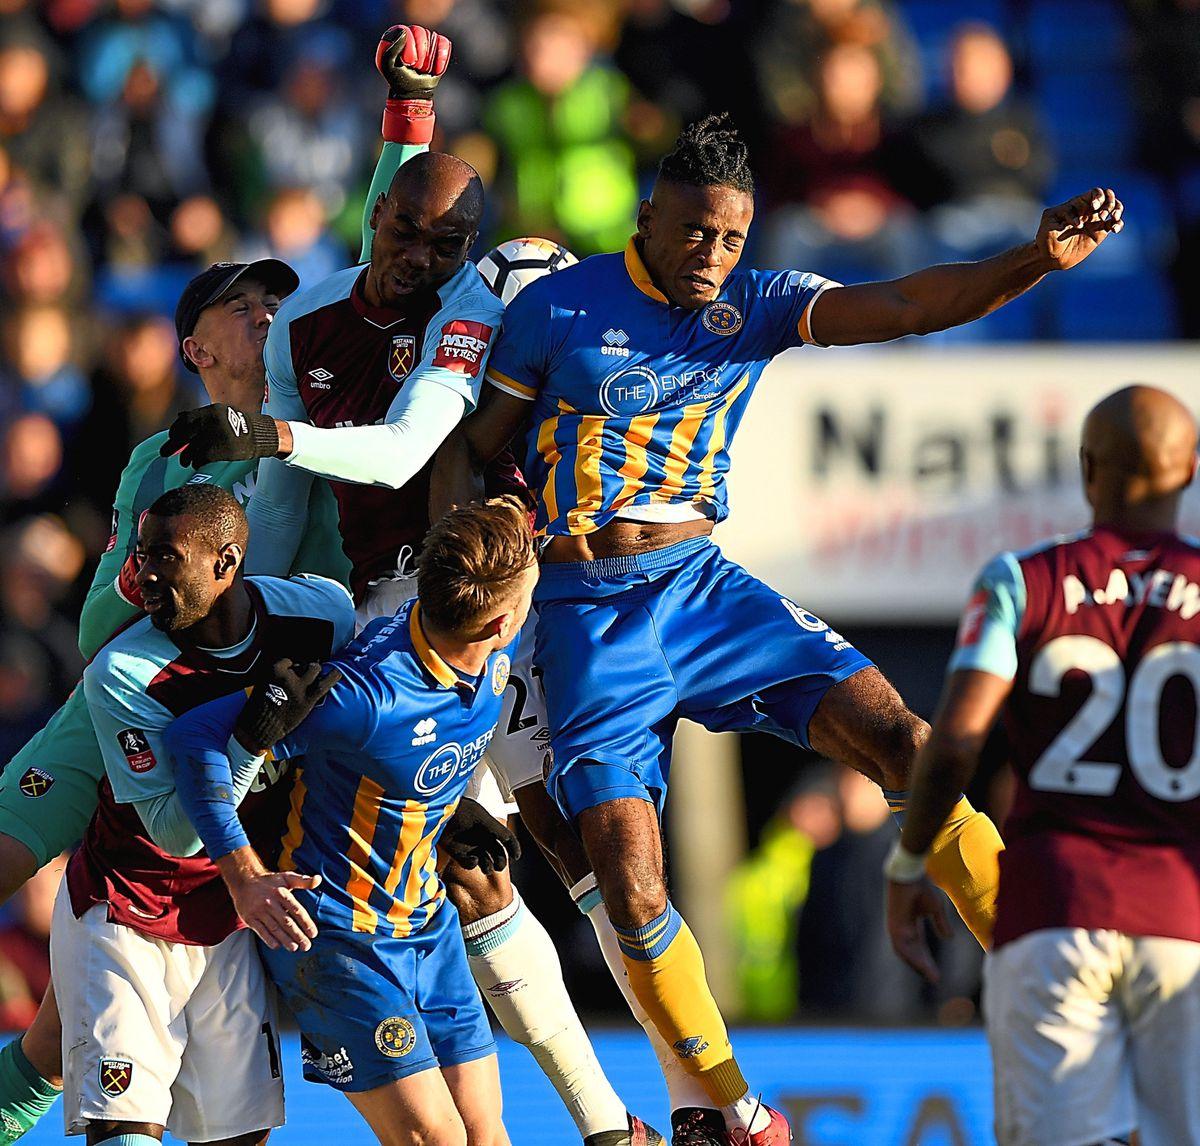 Omar Beckles against West Ham, and Joe Hart, last season (AMA)